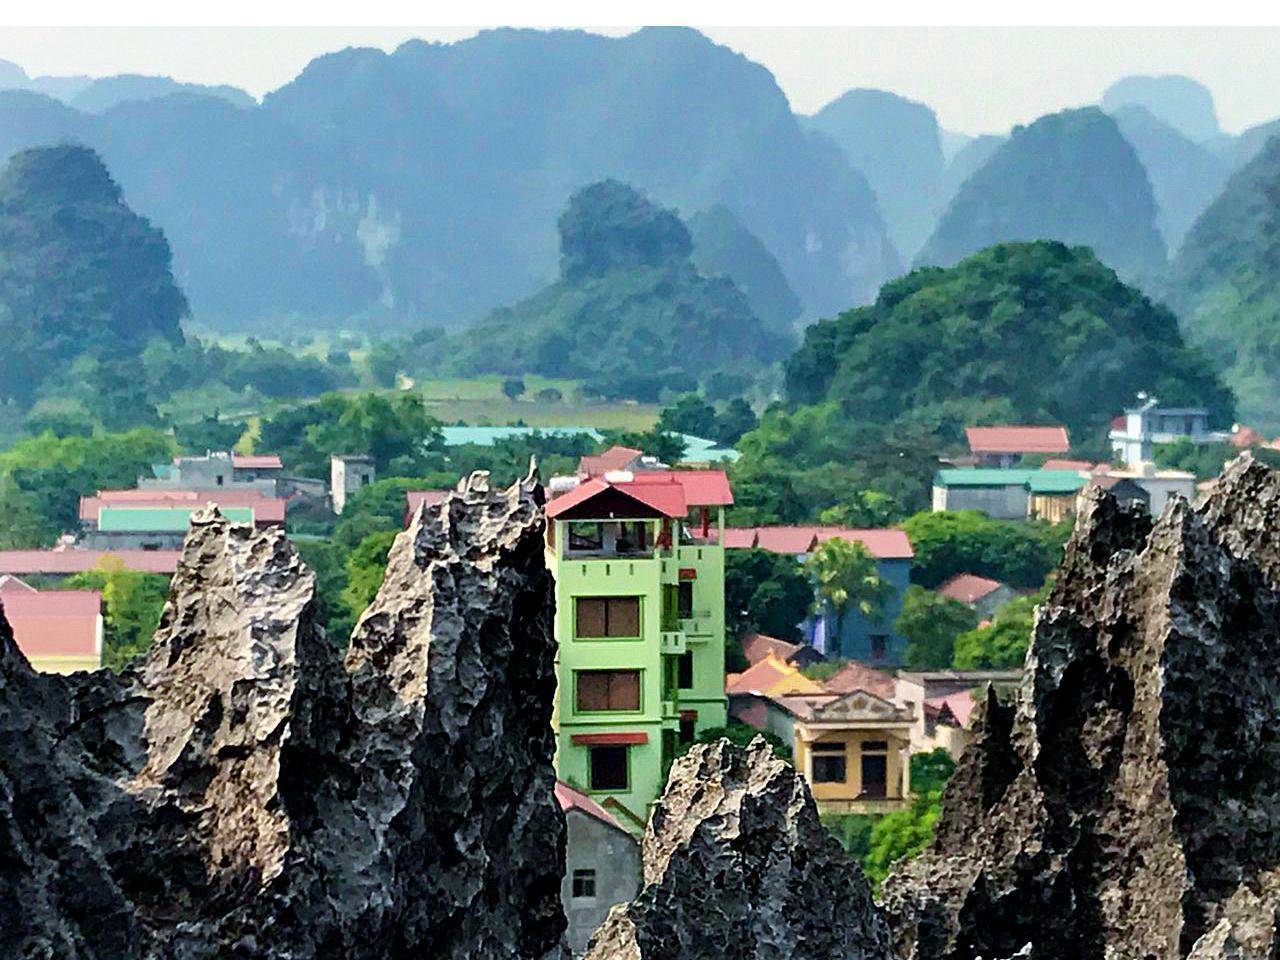 Trang An Mountain View Homestay